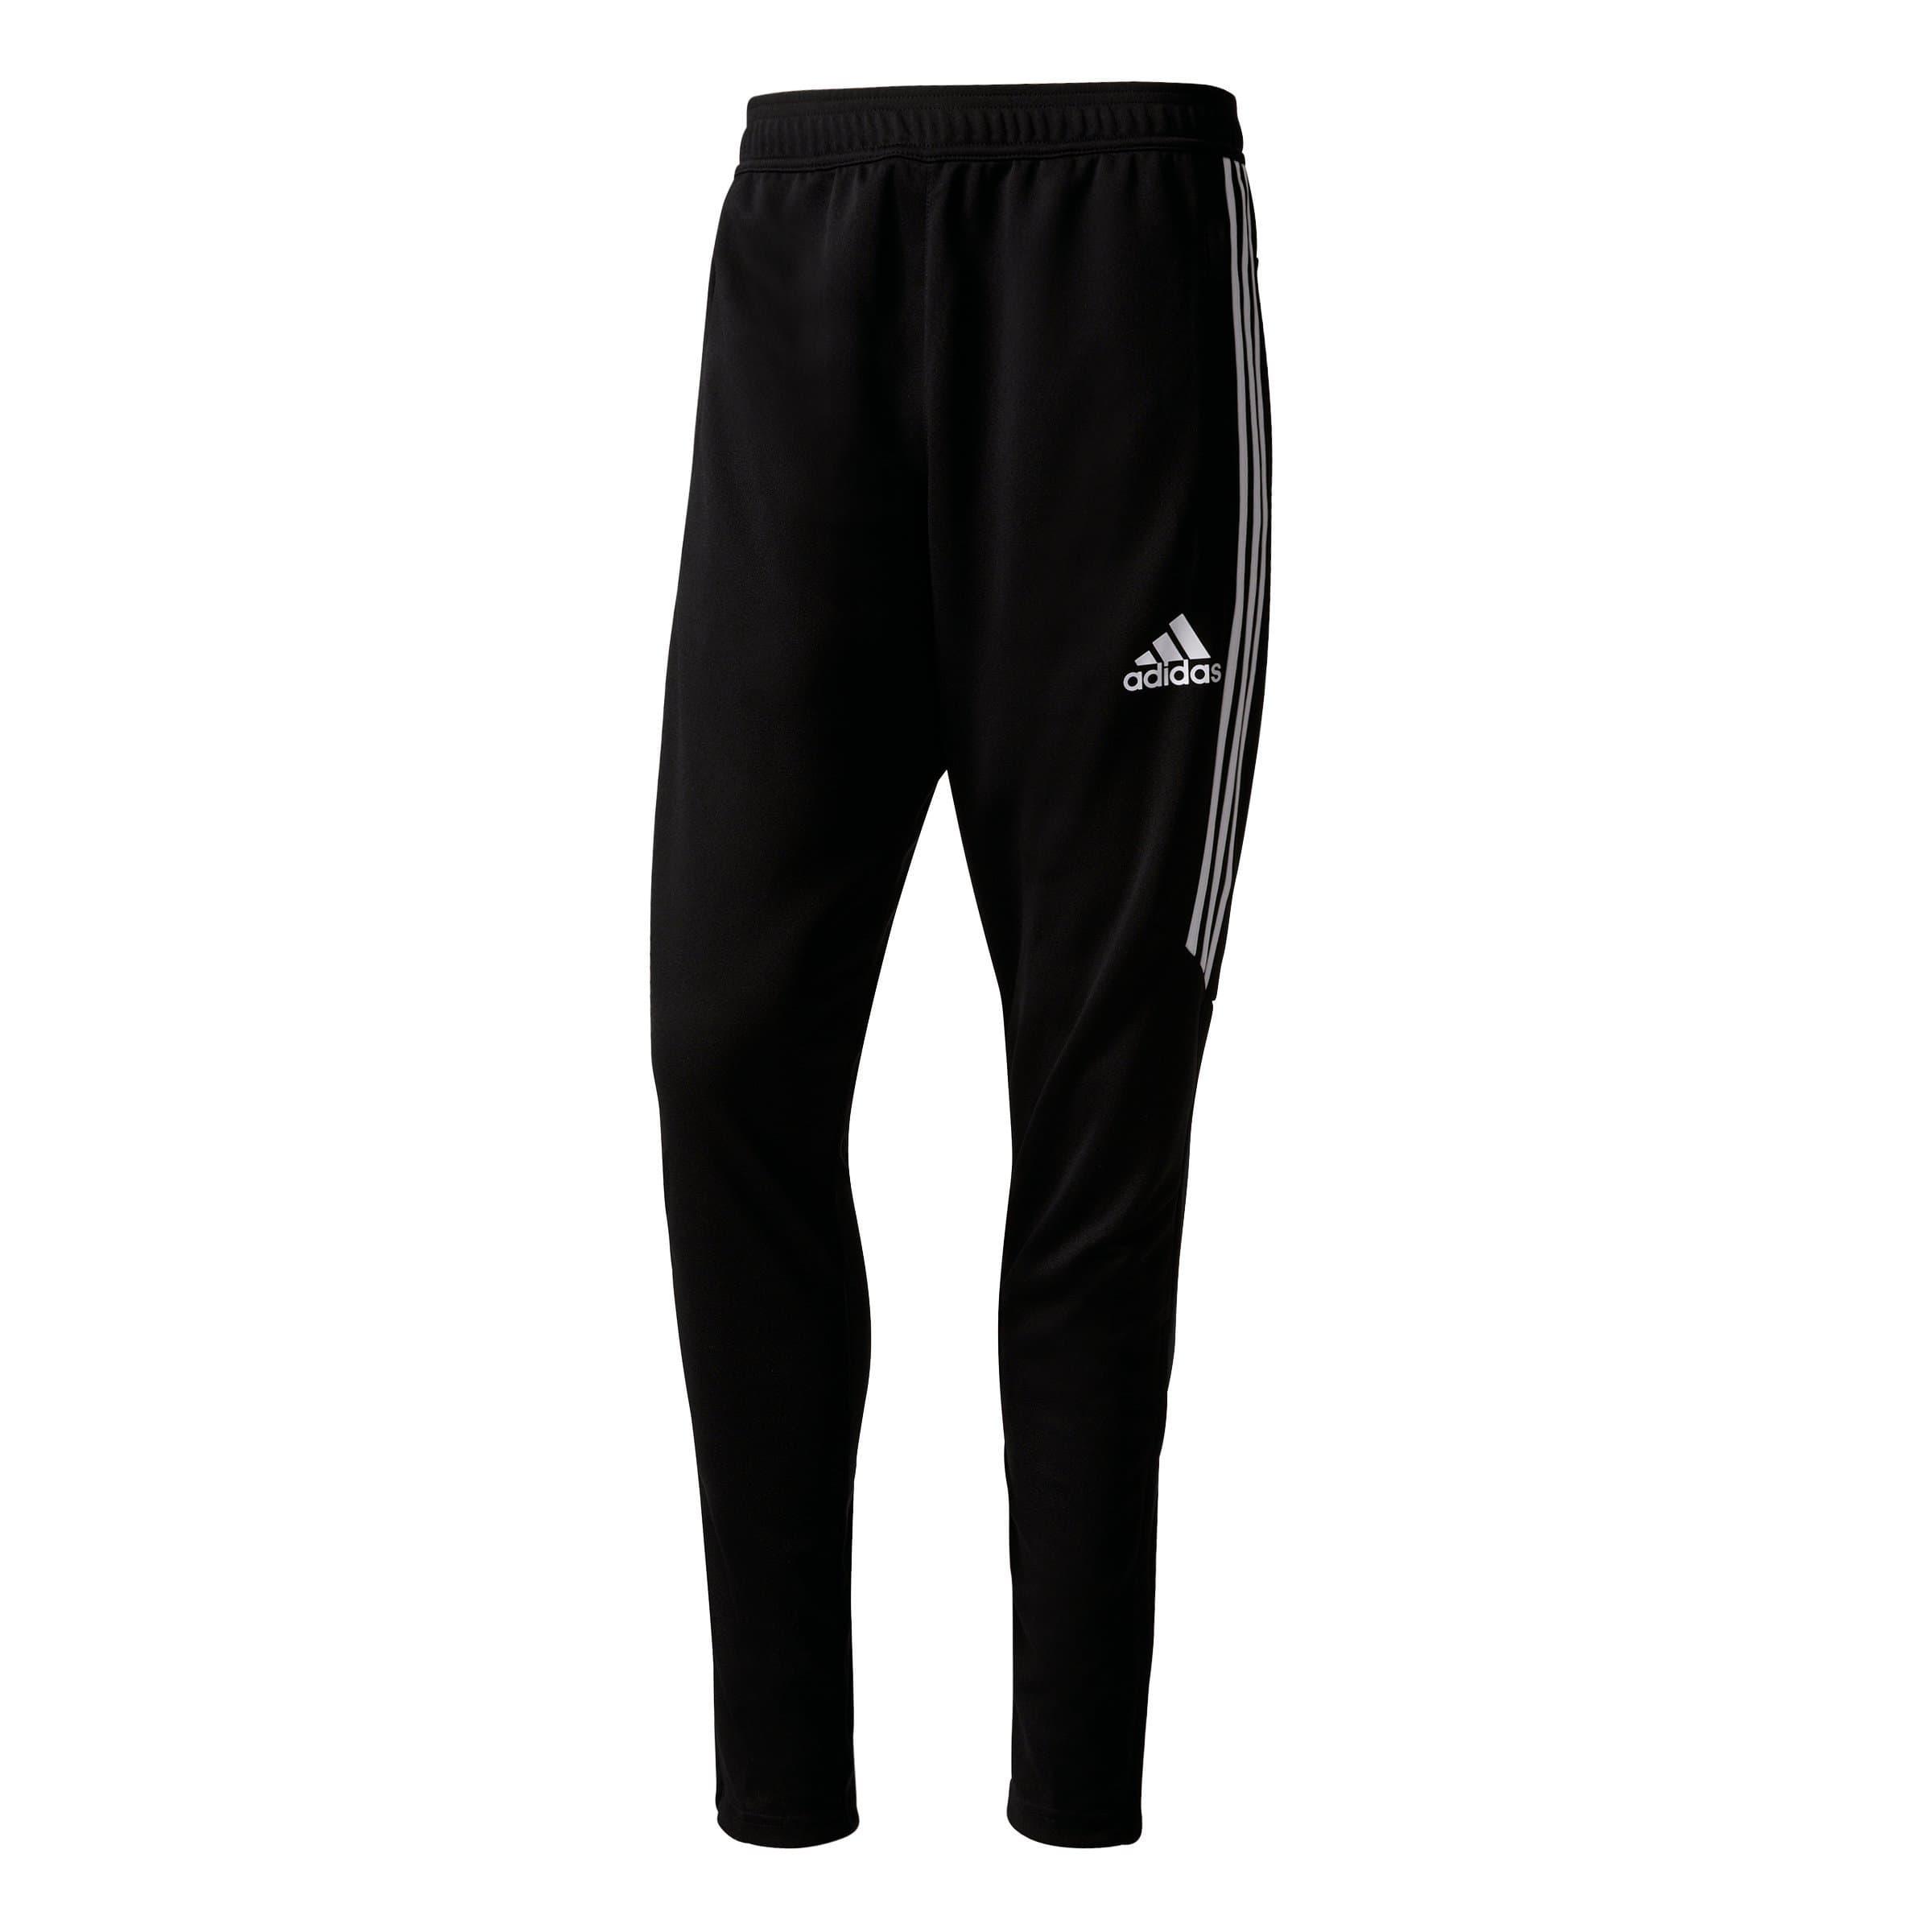 Adidas Tiro 17 Training Pant Herren Fussball Hose